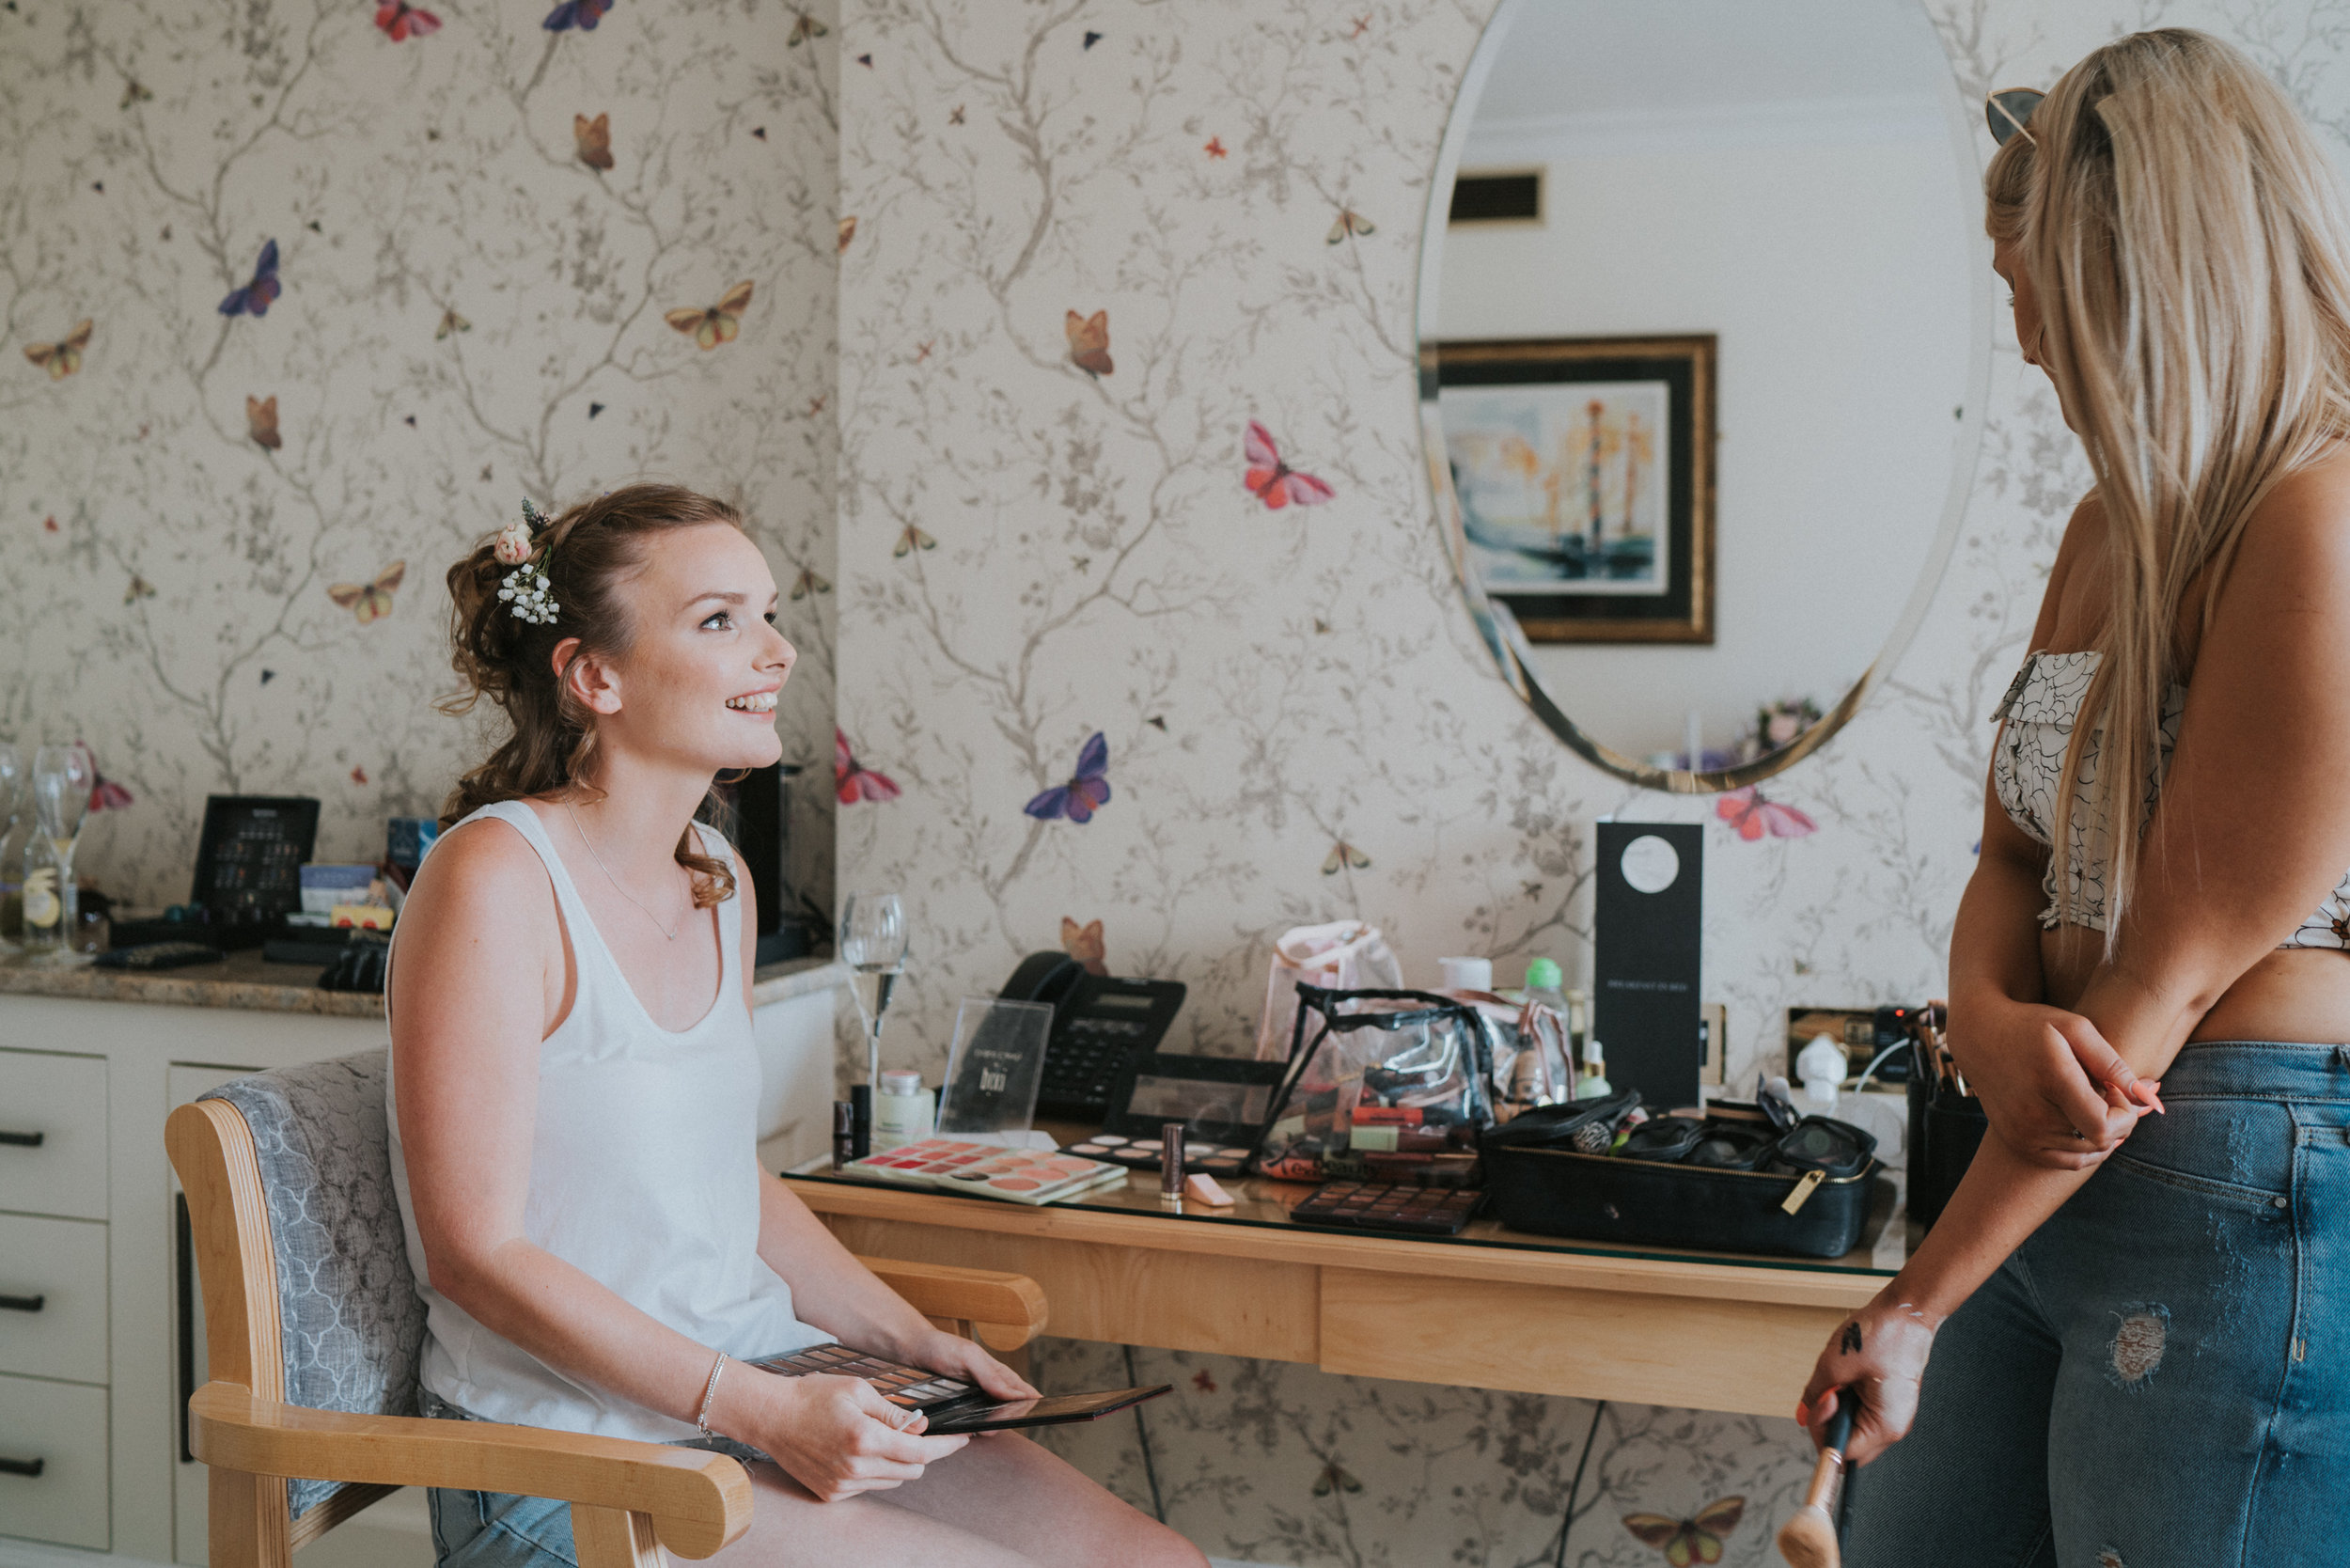 Grace-Elizabeth-Georgie-Amalaketu-Firstsite-Colchester-Essex-Boho-Buddhist-Wedding-Alternative-Wedding-Photography-Essex (15 of 100).jpg